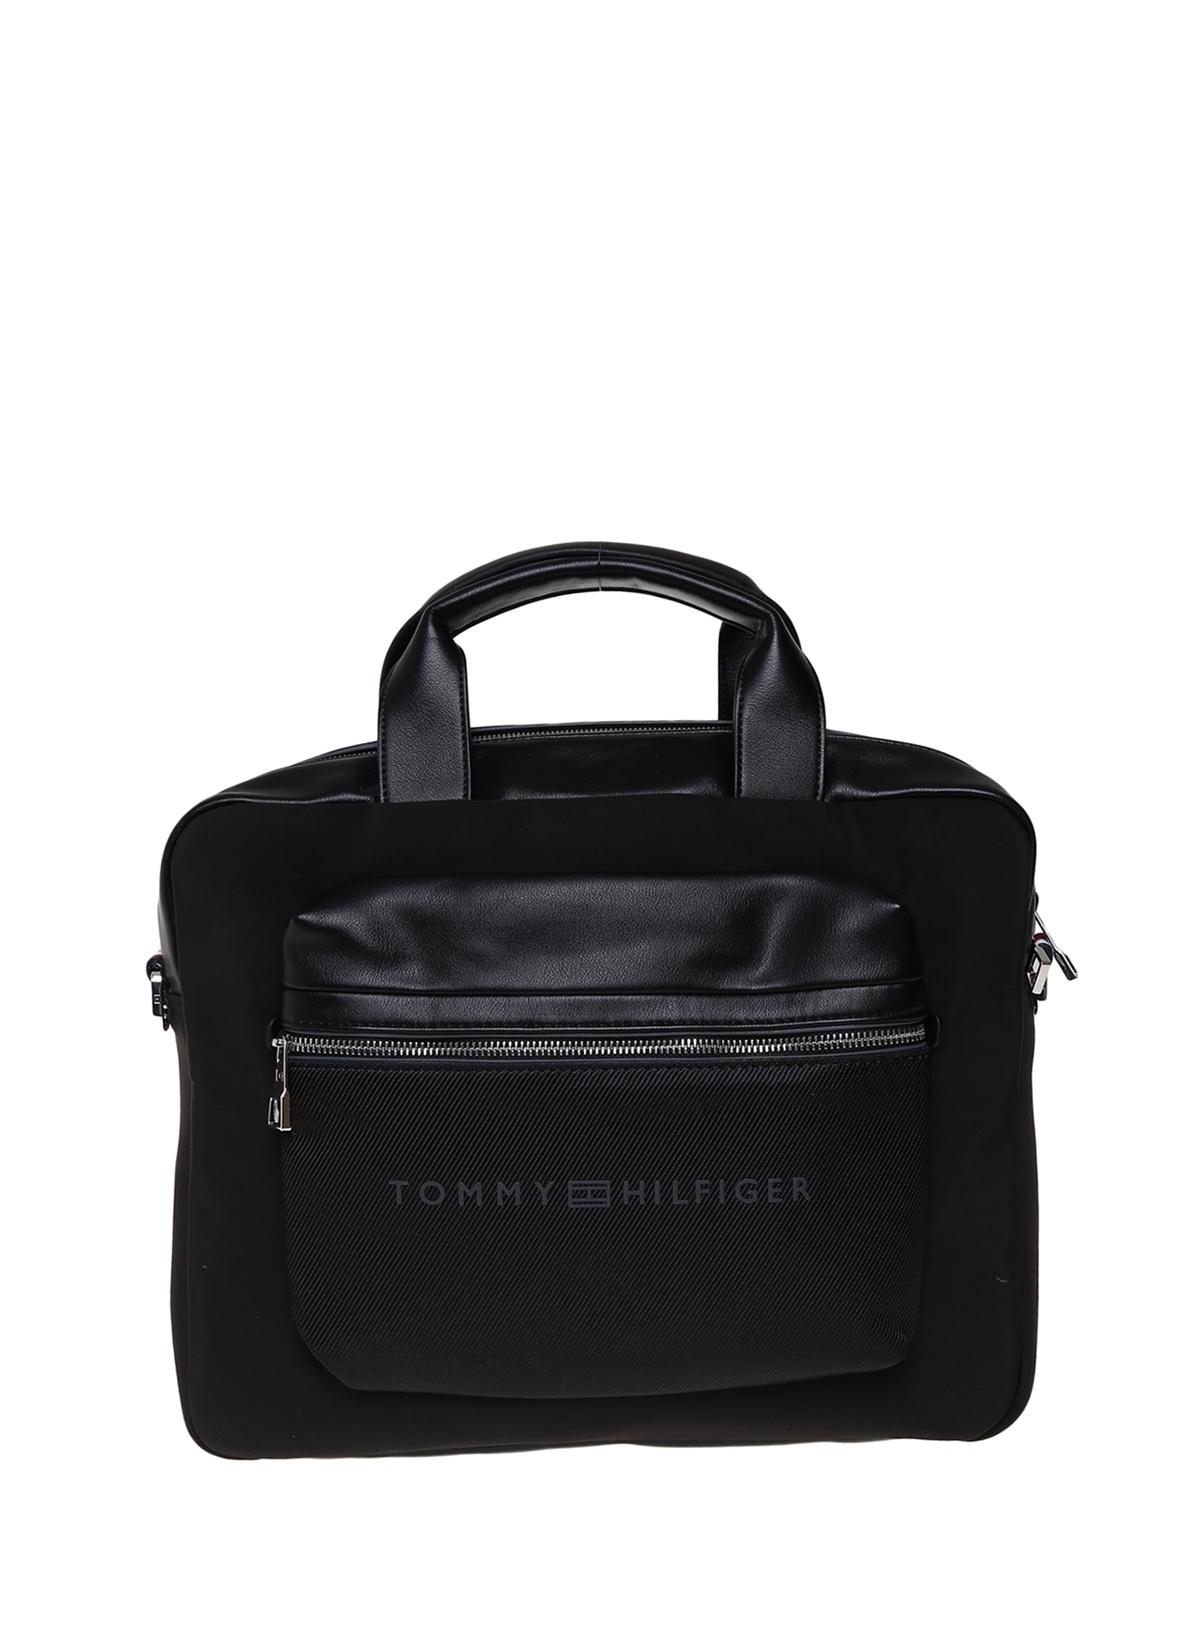 Tommy Hilfiger Laptop – Evrak Çantası Am0am04249002-tommy-hilfiger-lapto – 939.0 TL